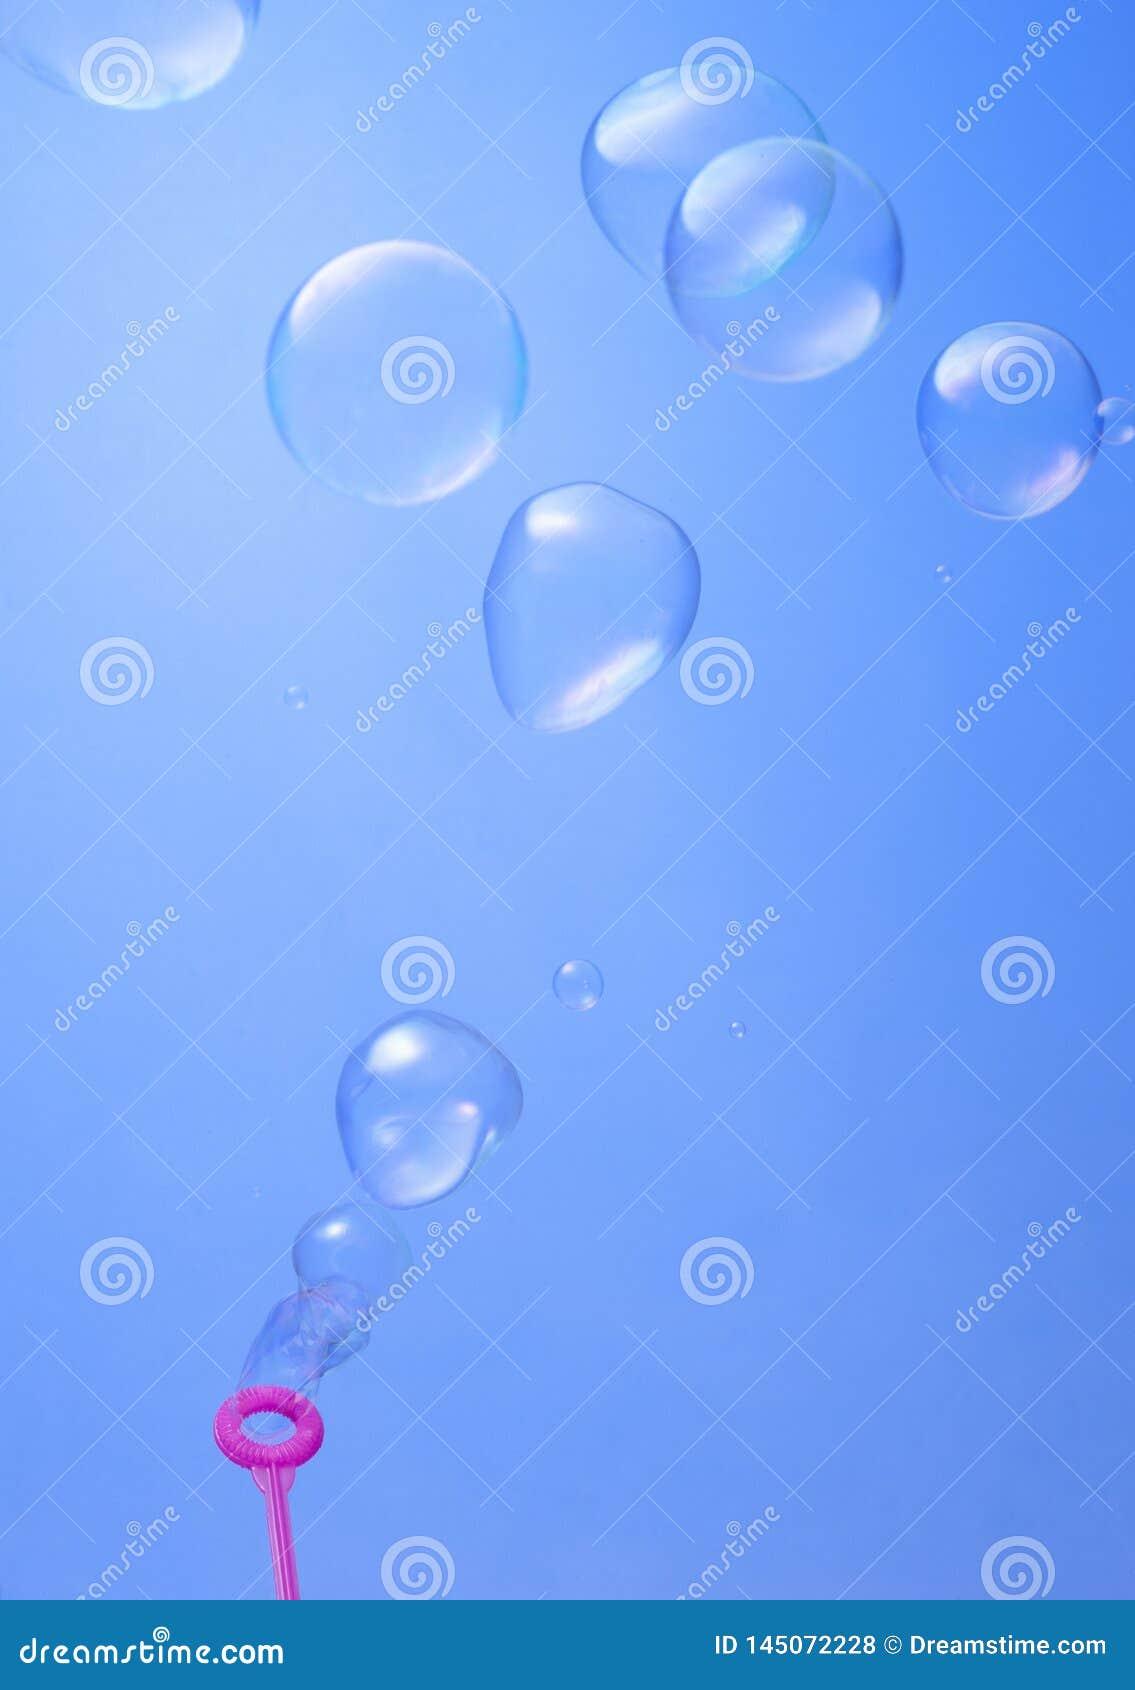 Дуя пузыри супа на голубой предпосылке